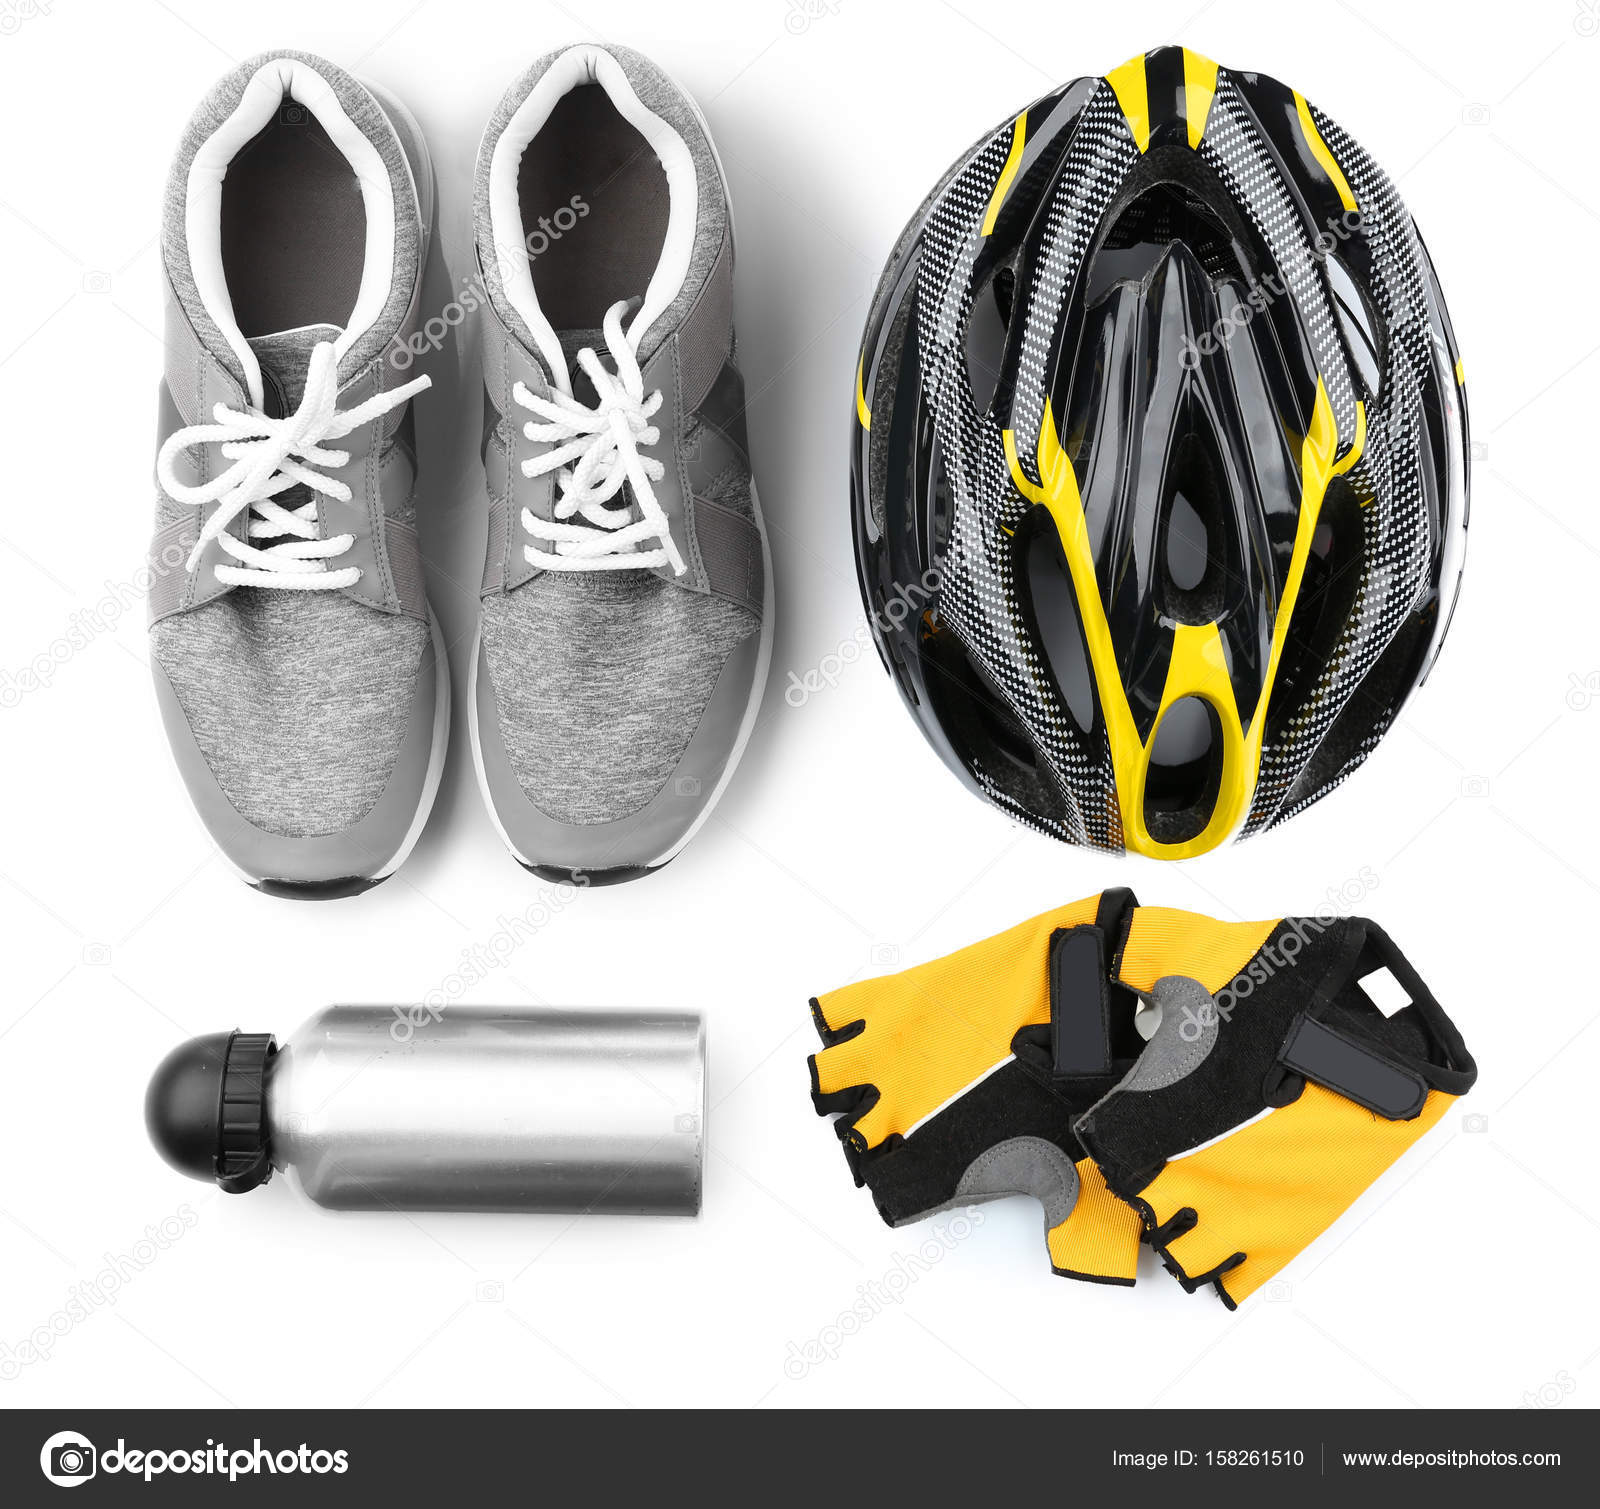 fahrradzubeh r set stockfoto belchonock 158261510. Black Bedroom Furniture Sets. Home Design Ideas